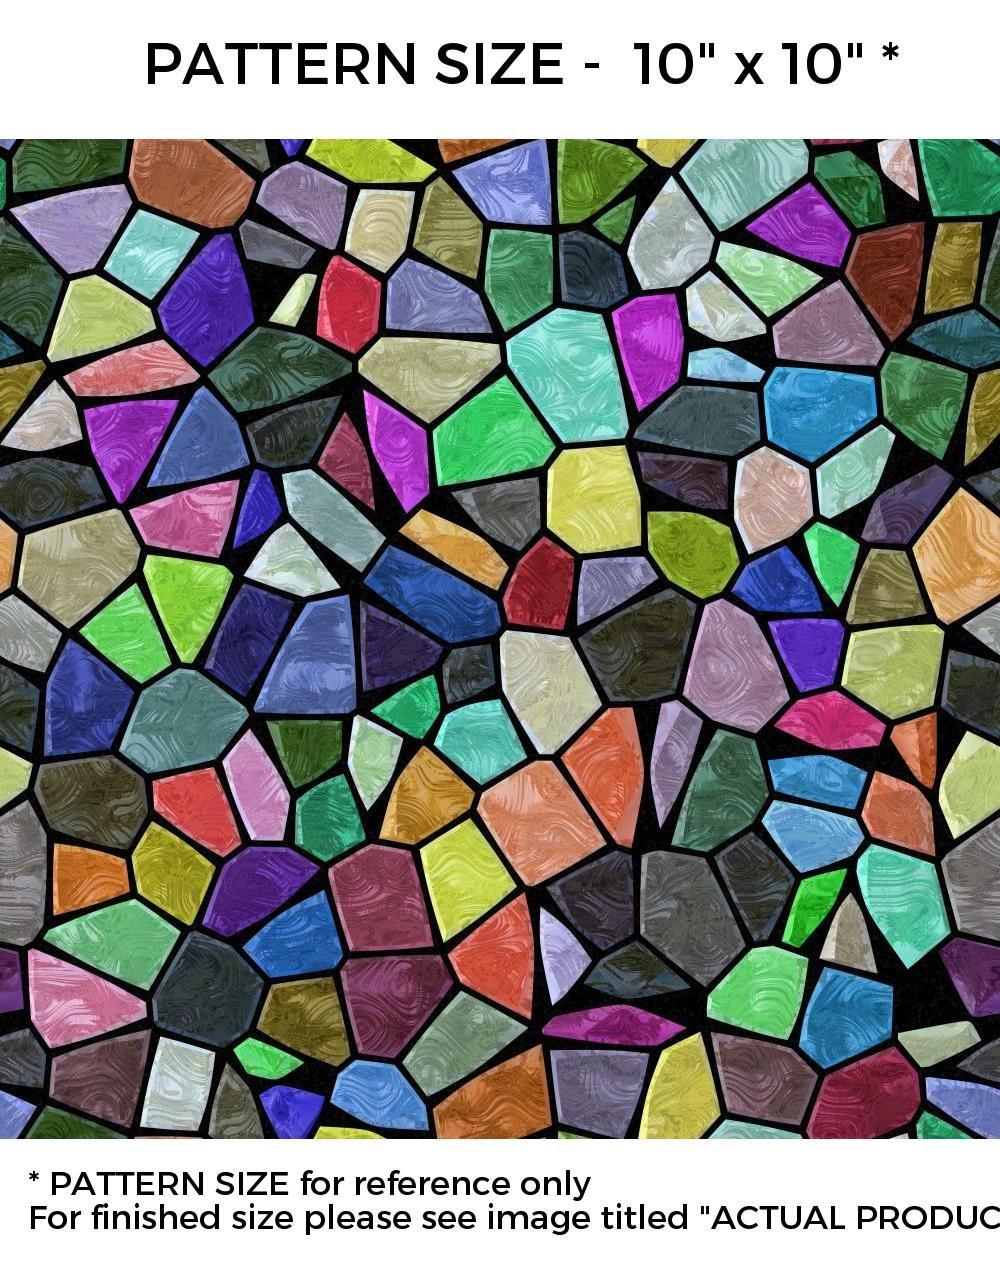 WindowPix 12 x 36 Multi-colored Victorian Pattern Window Film Static Cling Film UV Filtering Energy Saving